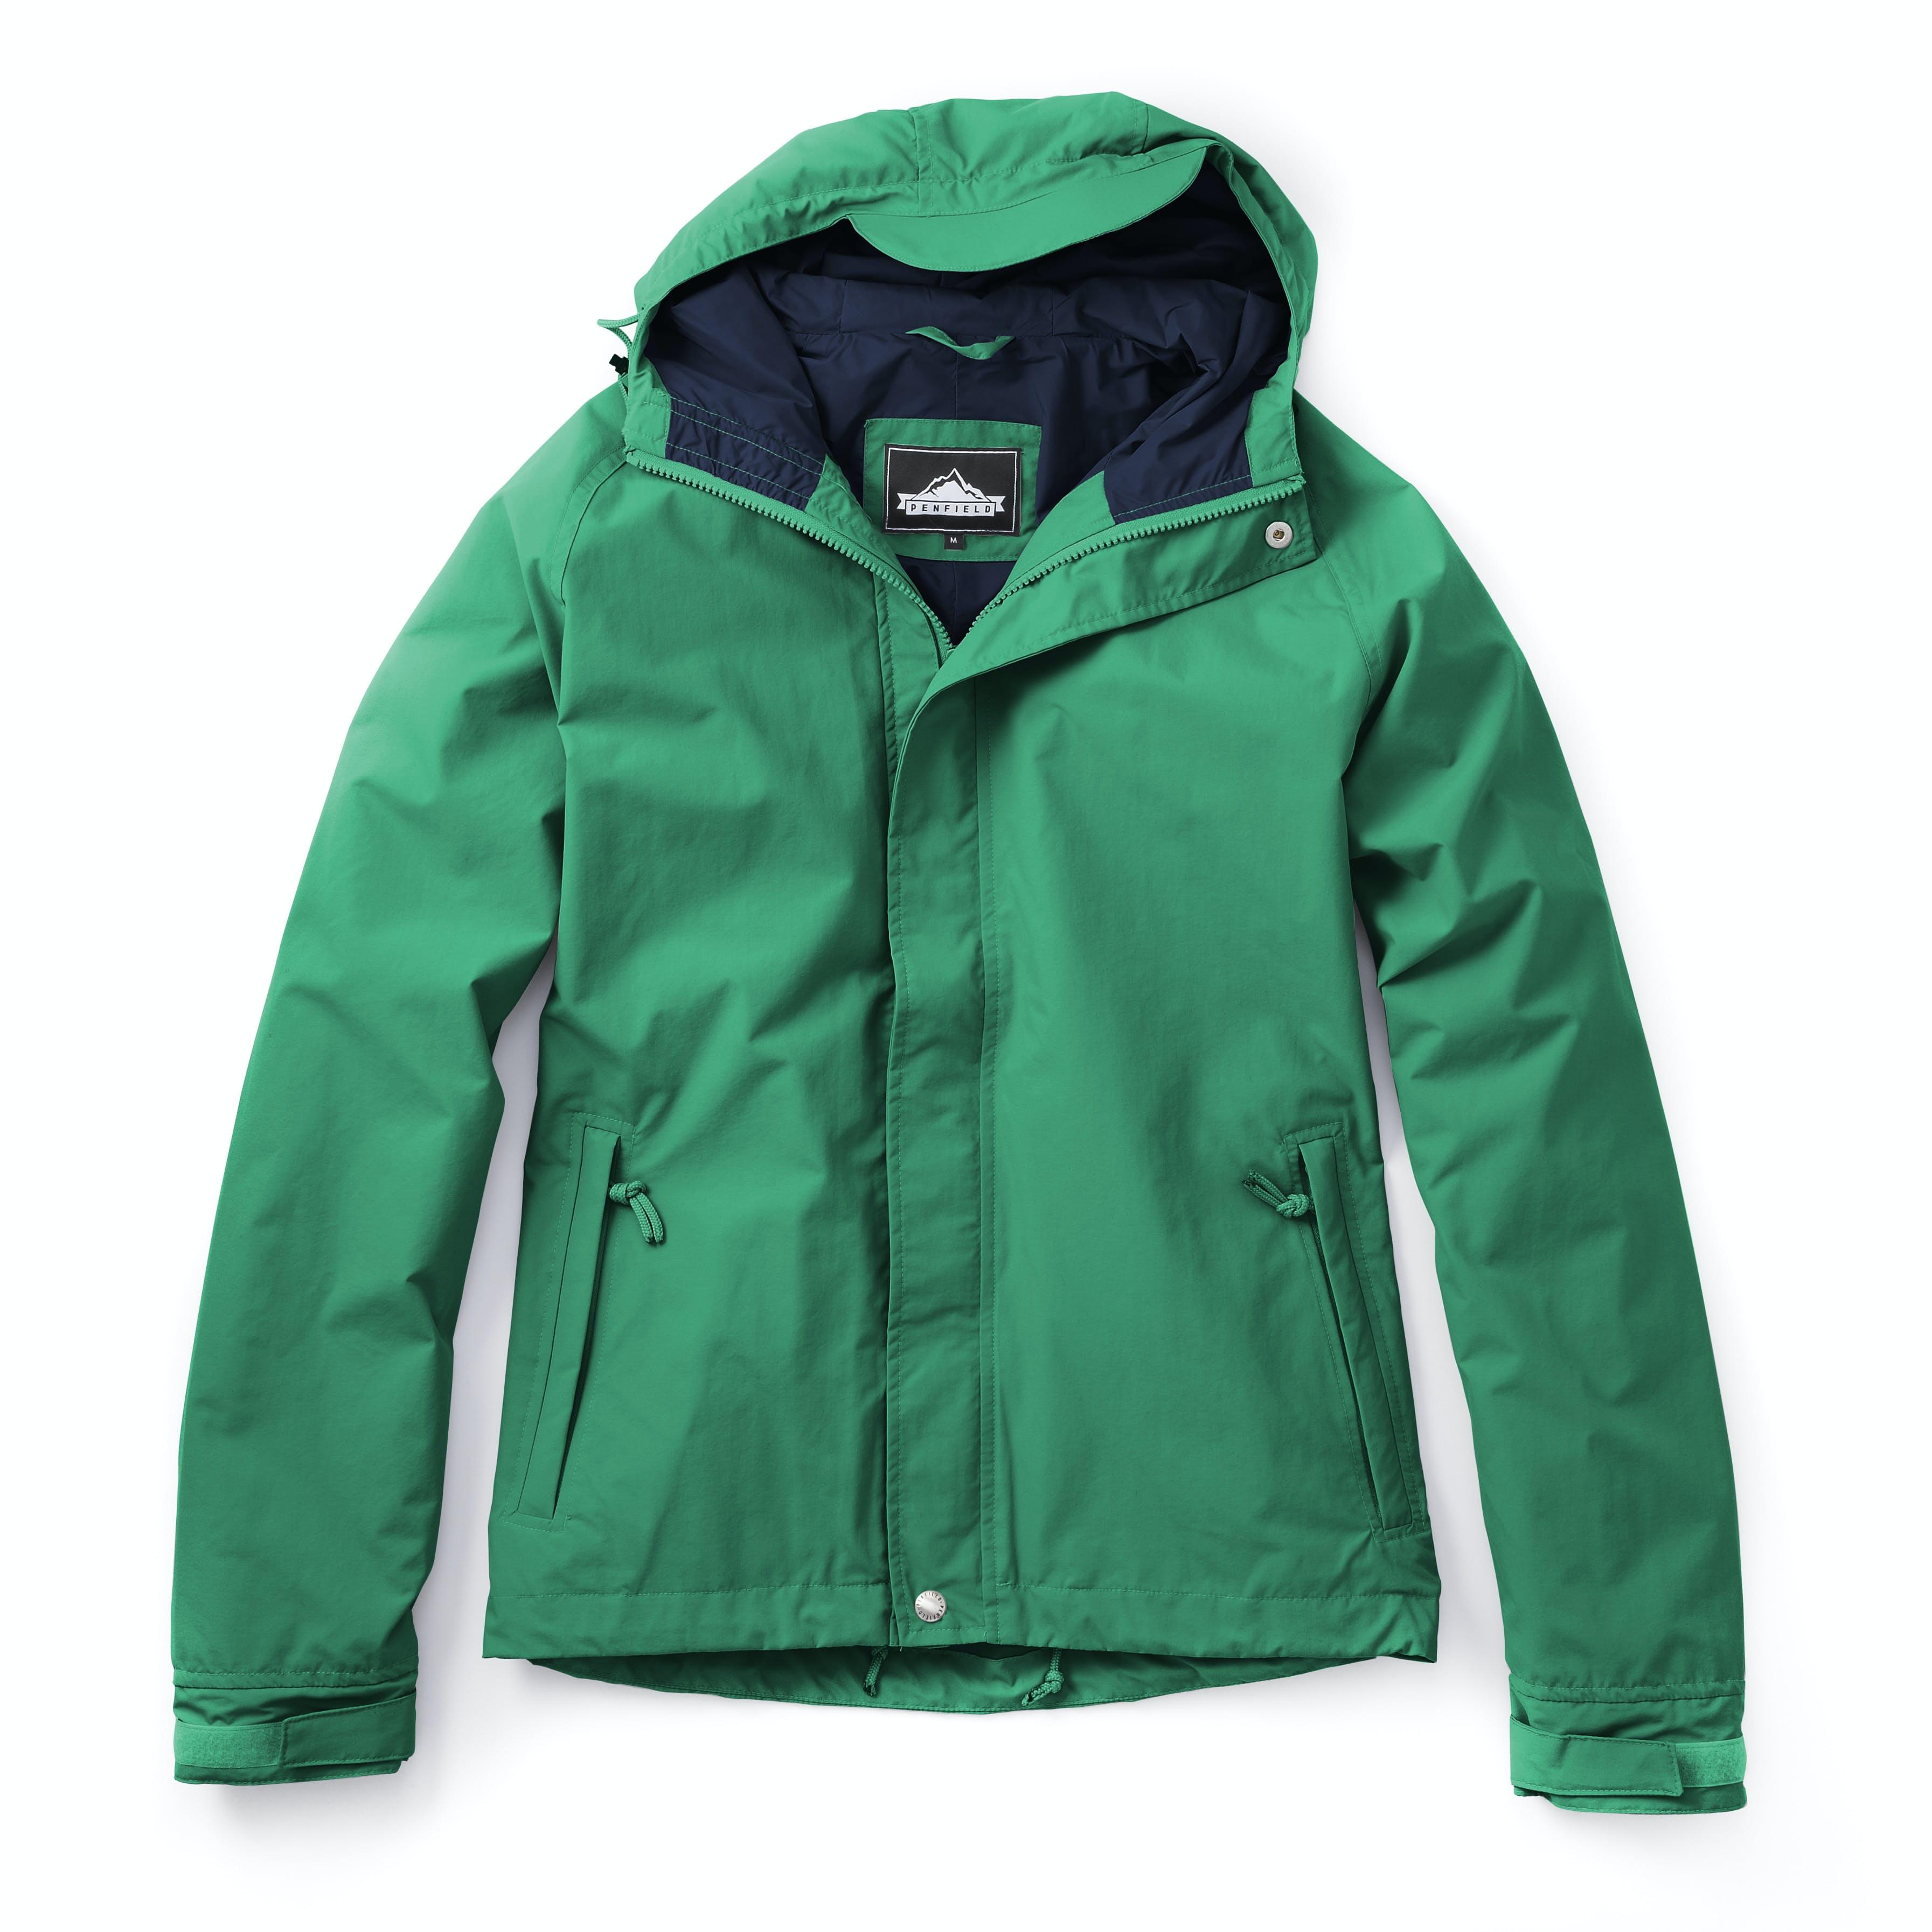 Uu58up8br1 penfield becket jacket 0 original